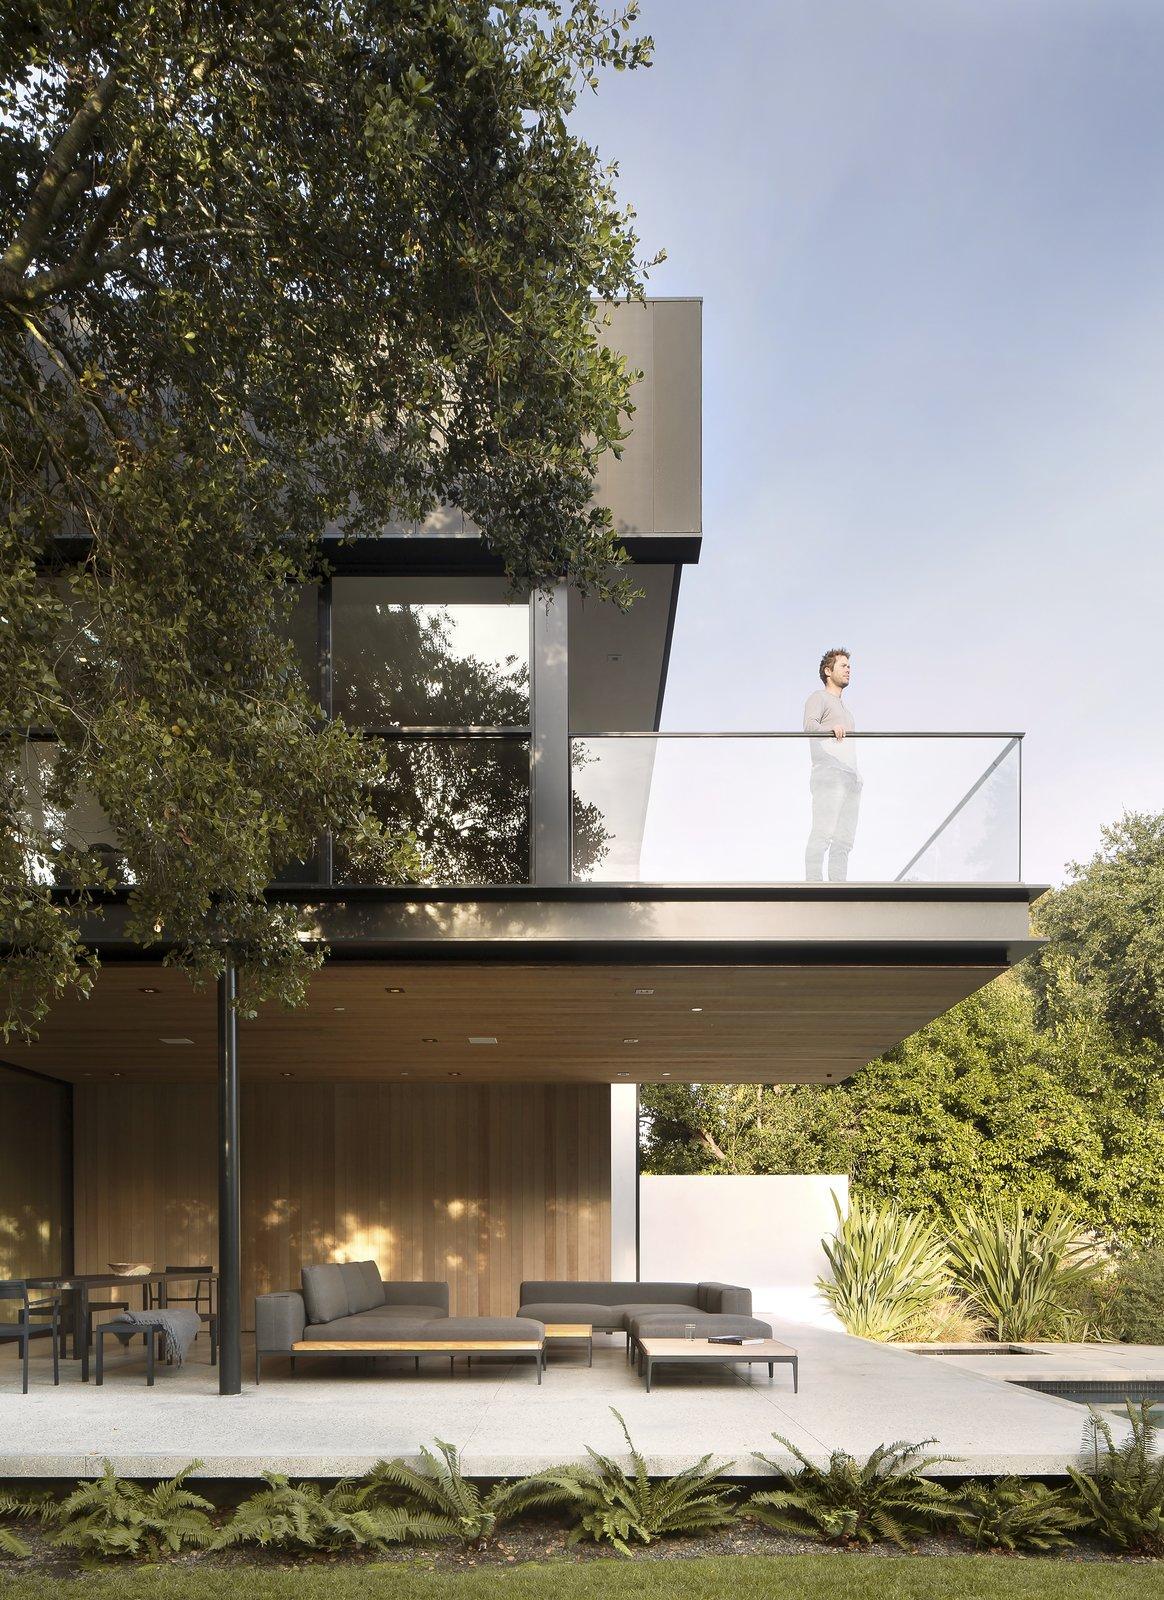 Tree House by Aidlin Darling Design balcony